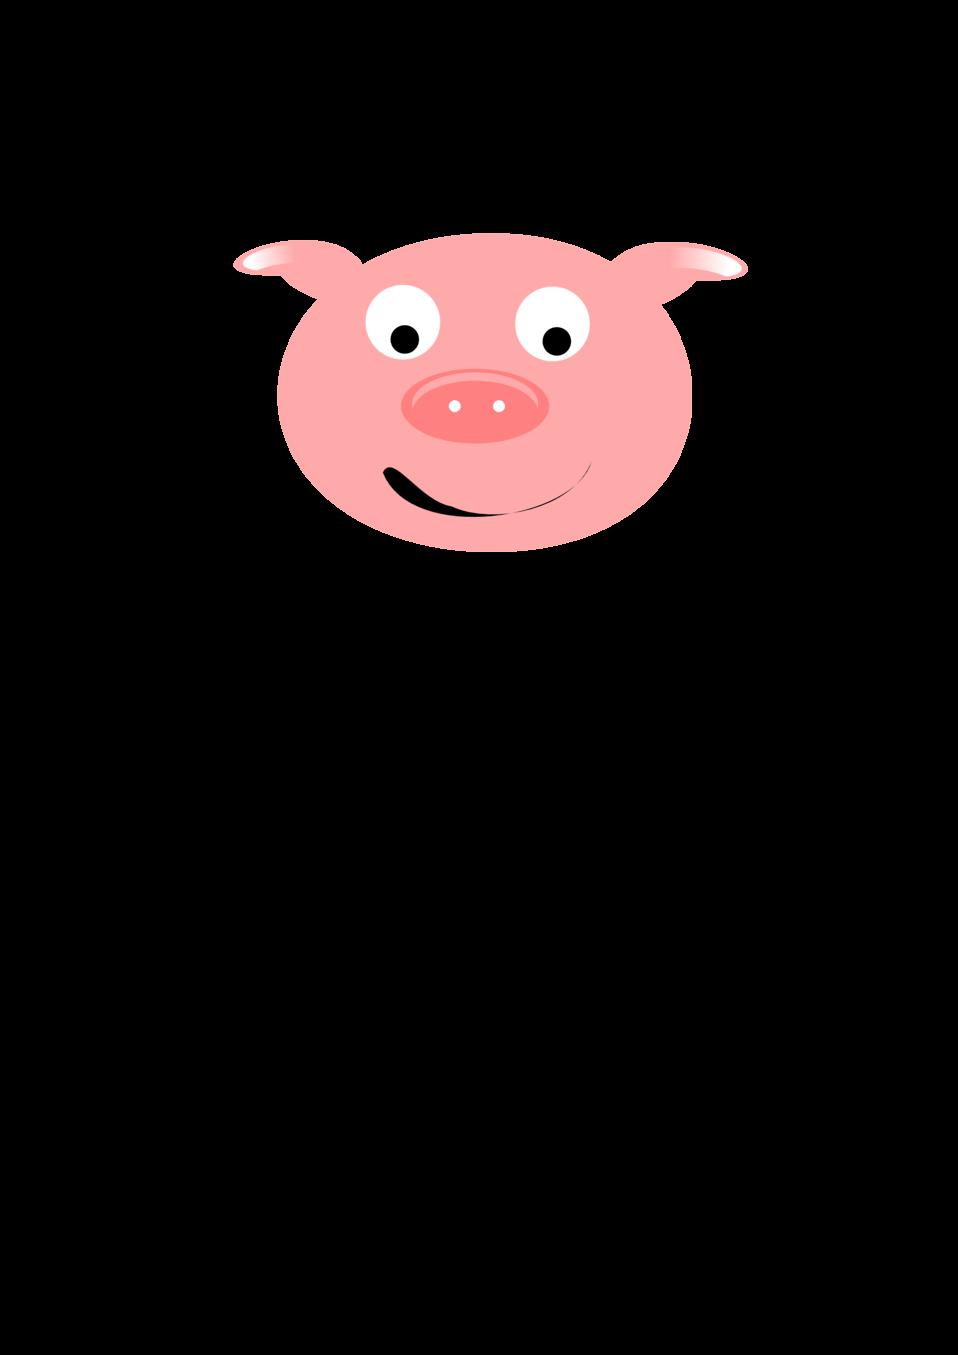 Public domain clip art. Clipart pig character